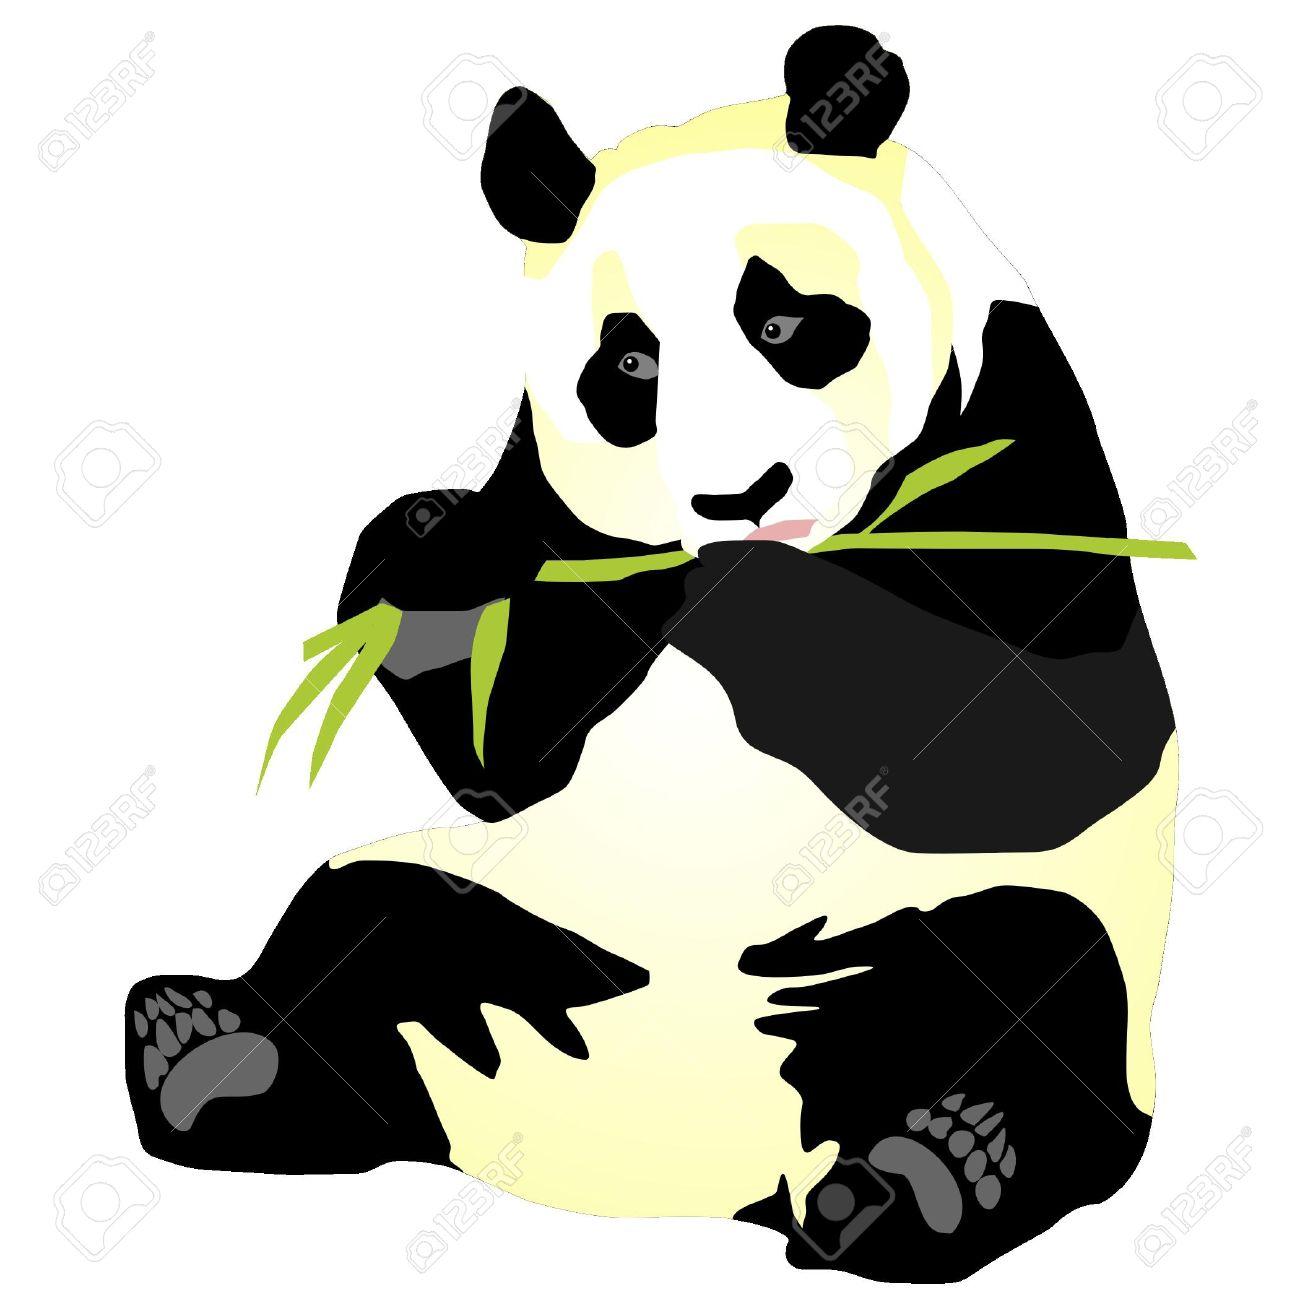 Giant Panda Royalty Free Cliparts, Vectors, And Stock Illustration.